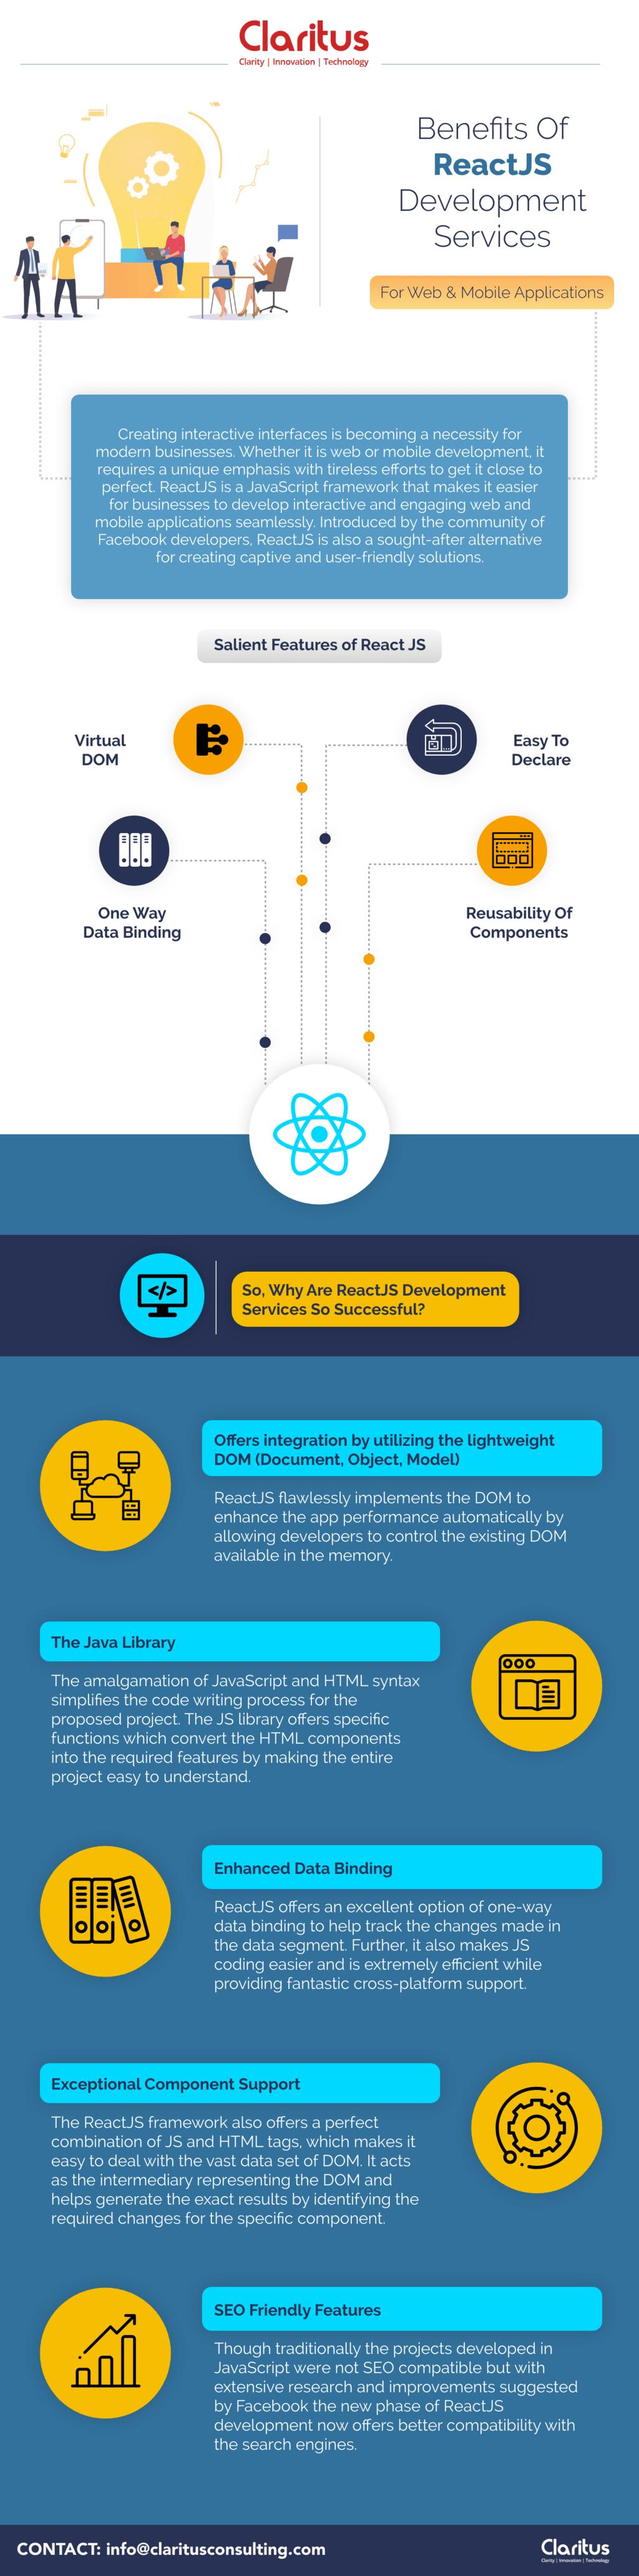 Benefits Of ReactJS Development Services For Web & Mobile Ap... via Claritus Consulting